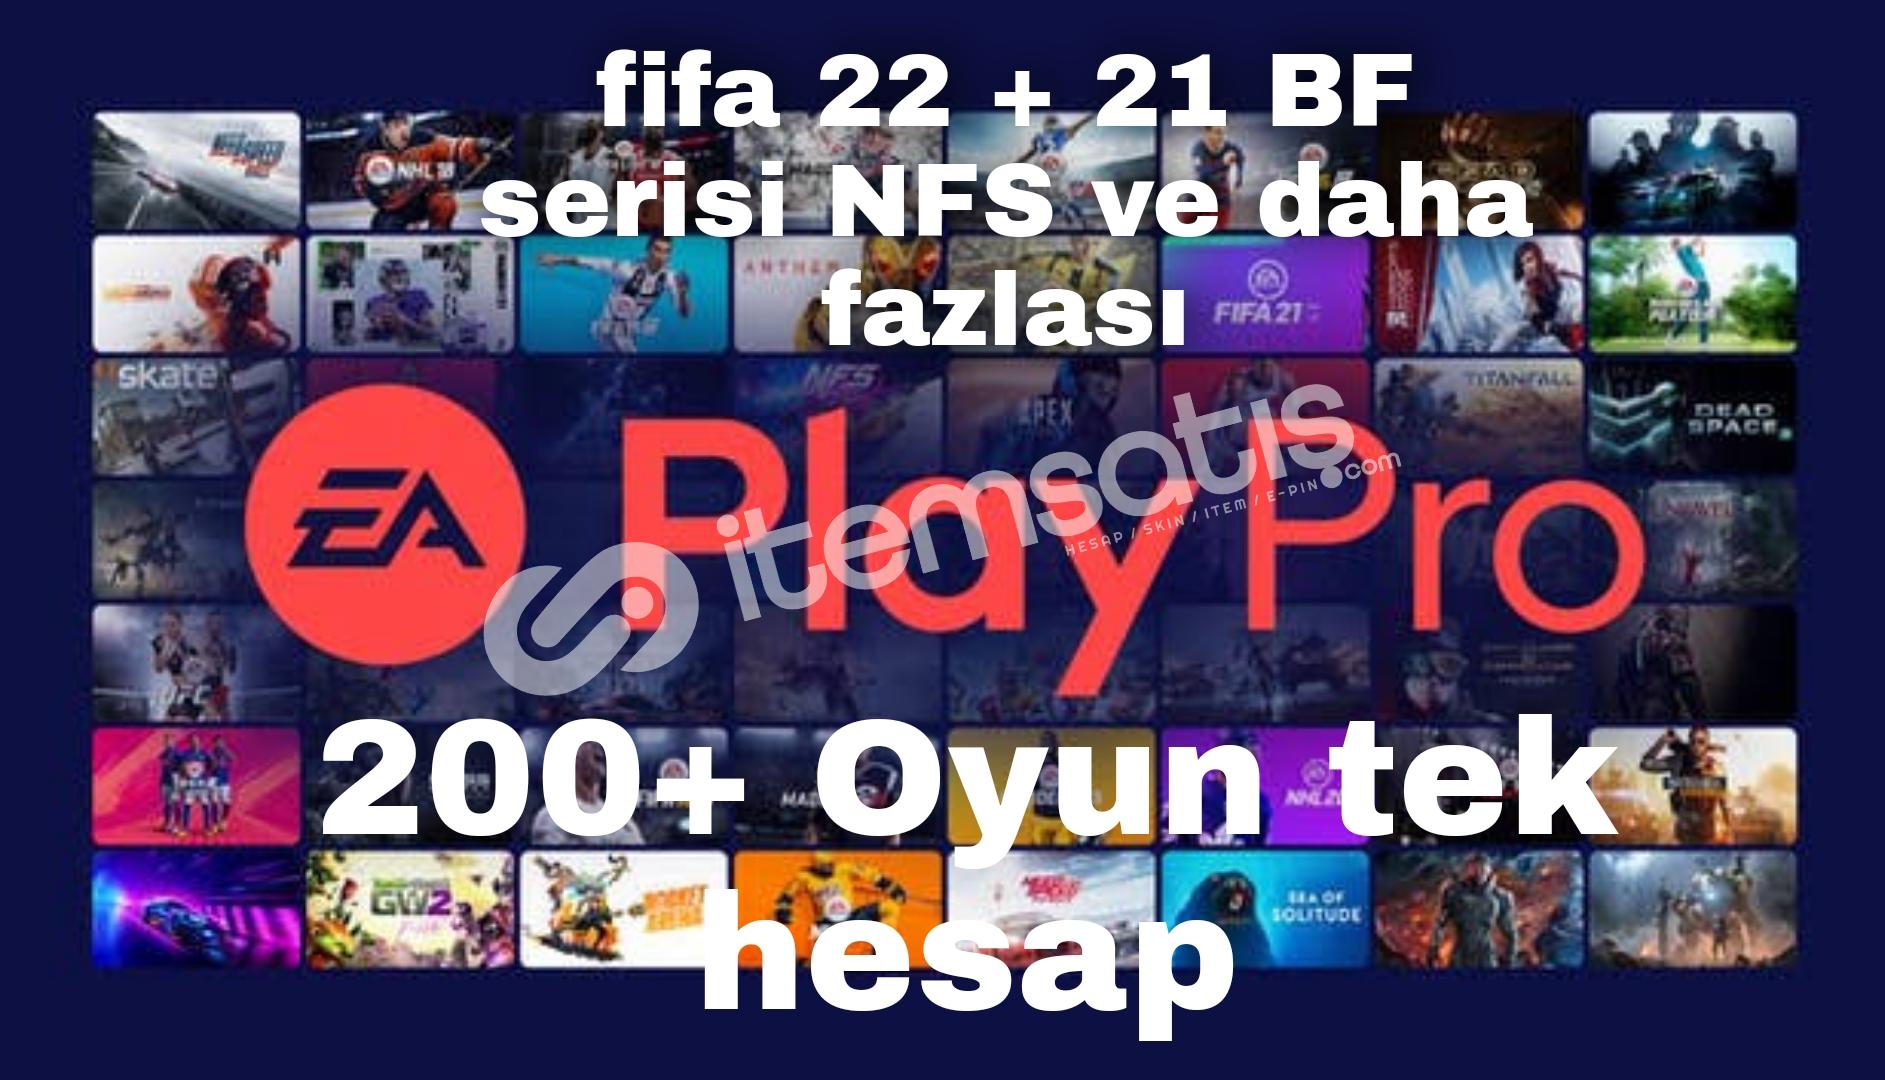 EA PLAY PRO | 200+ Oyun hepsi tek hesap